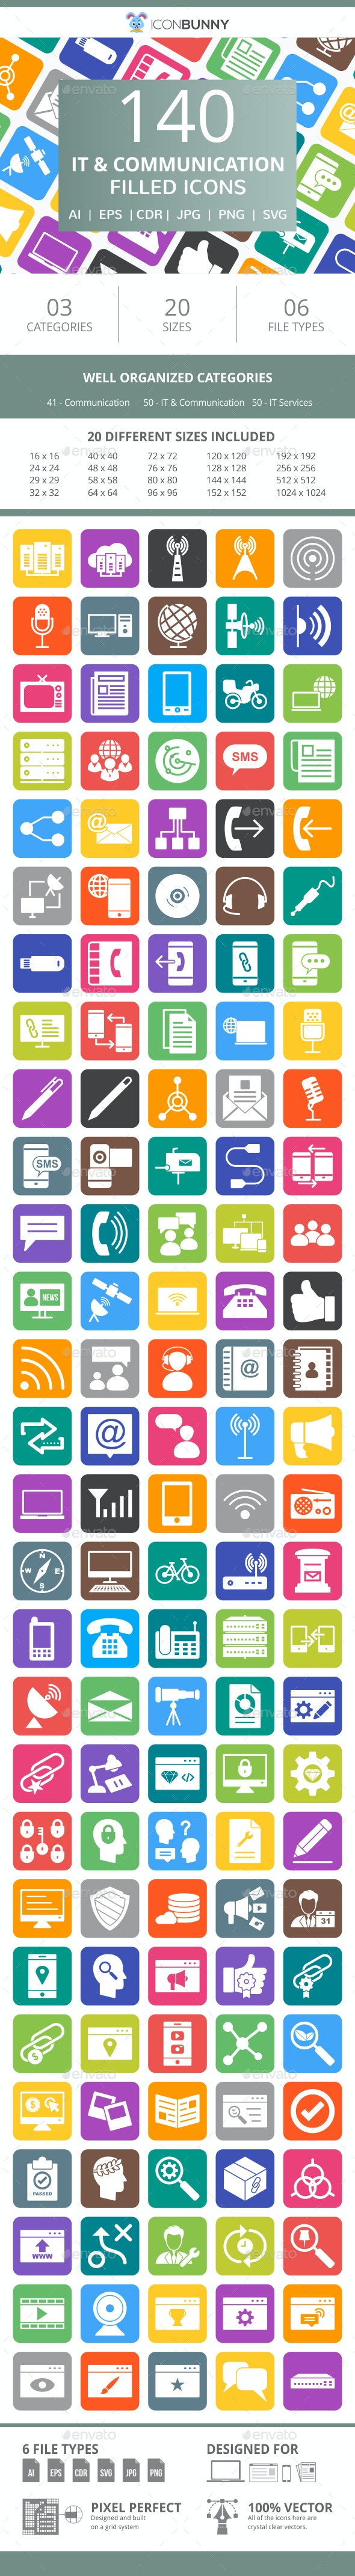 141 IT & Communication Filled Round Corner Icons - Icons